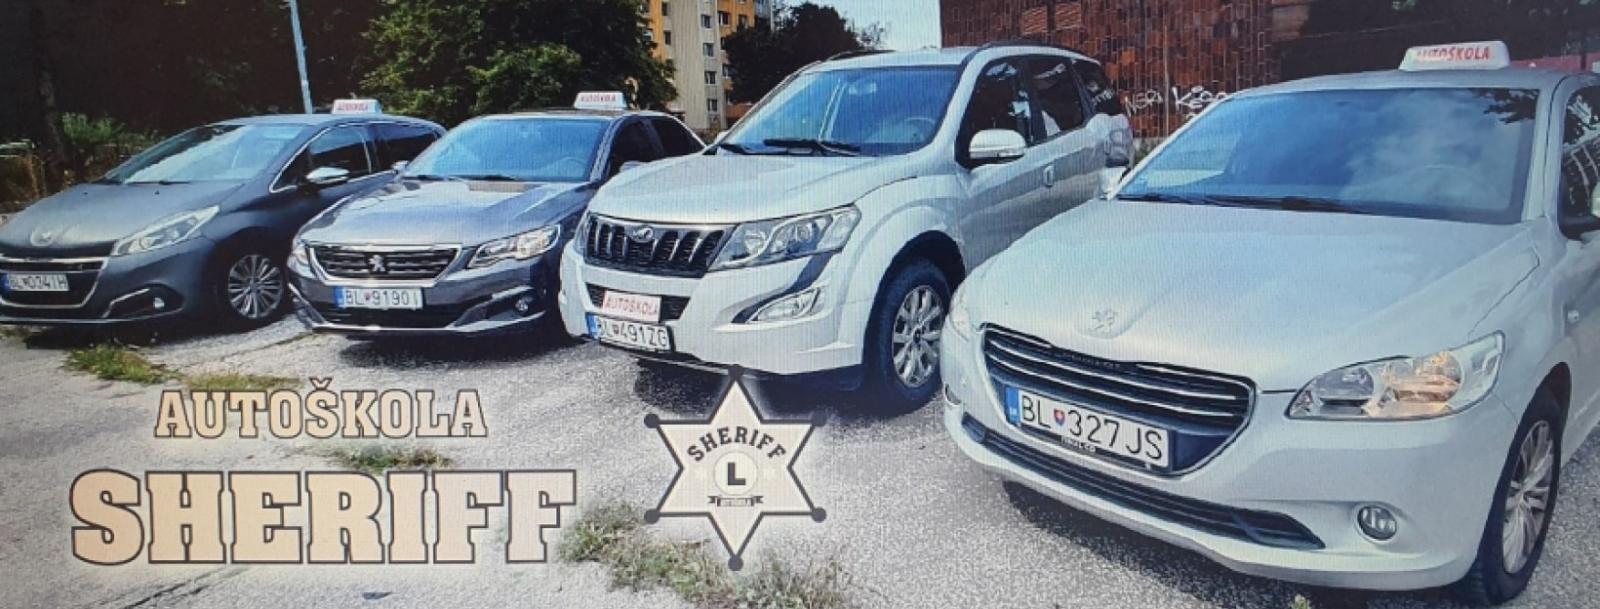 Autoškola Sheriff Bratislava - Autoškoly Slovenskej Republiky